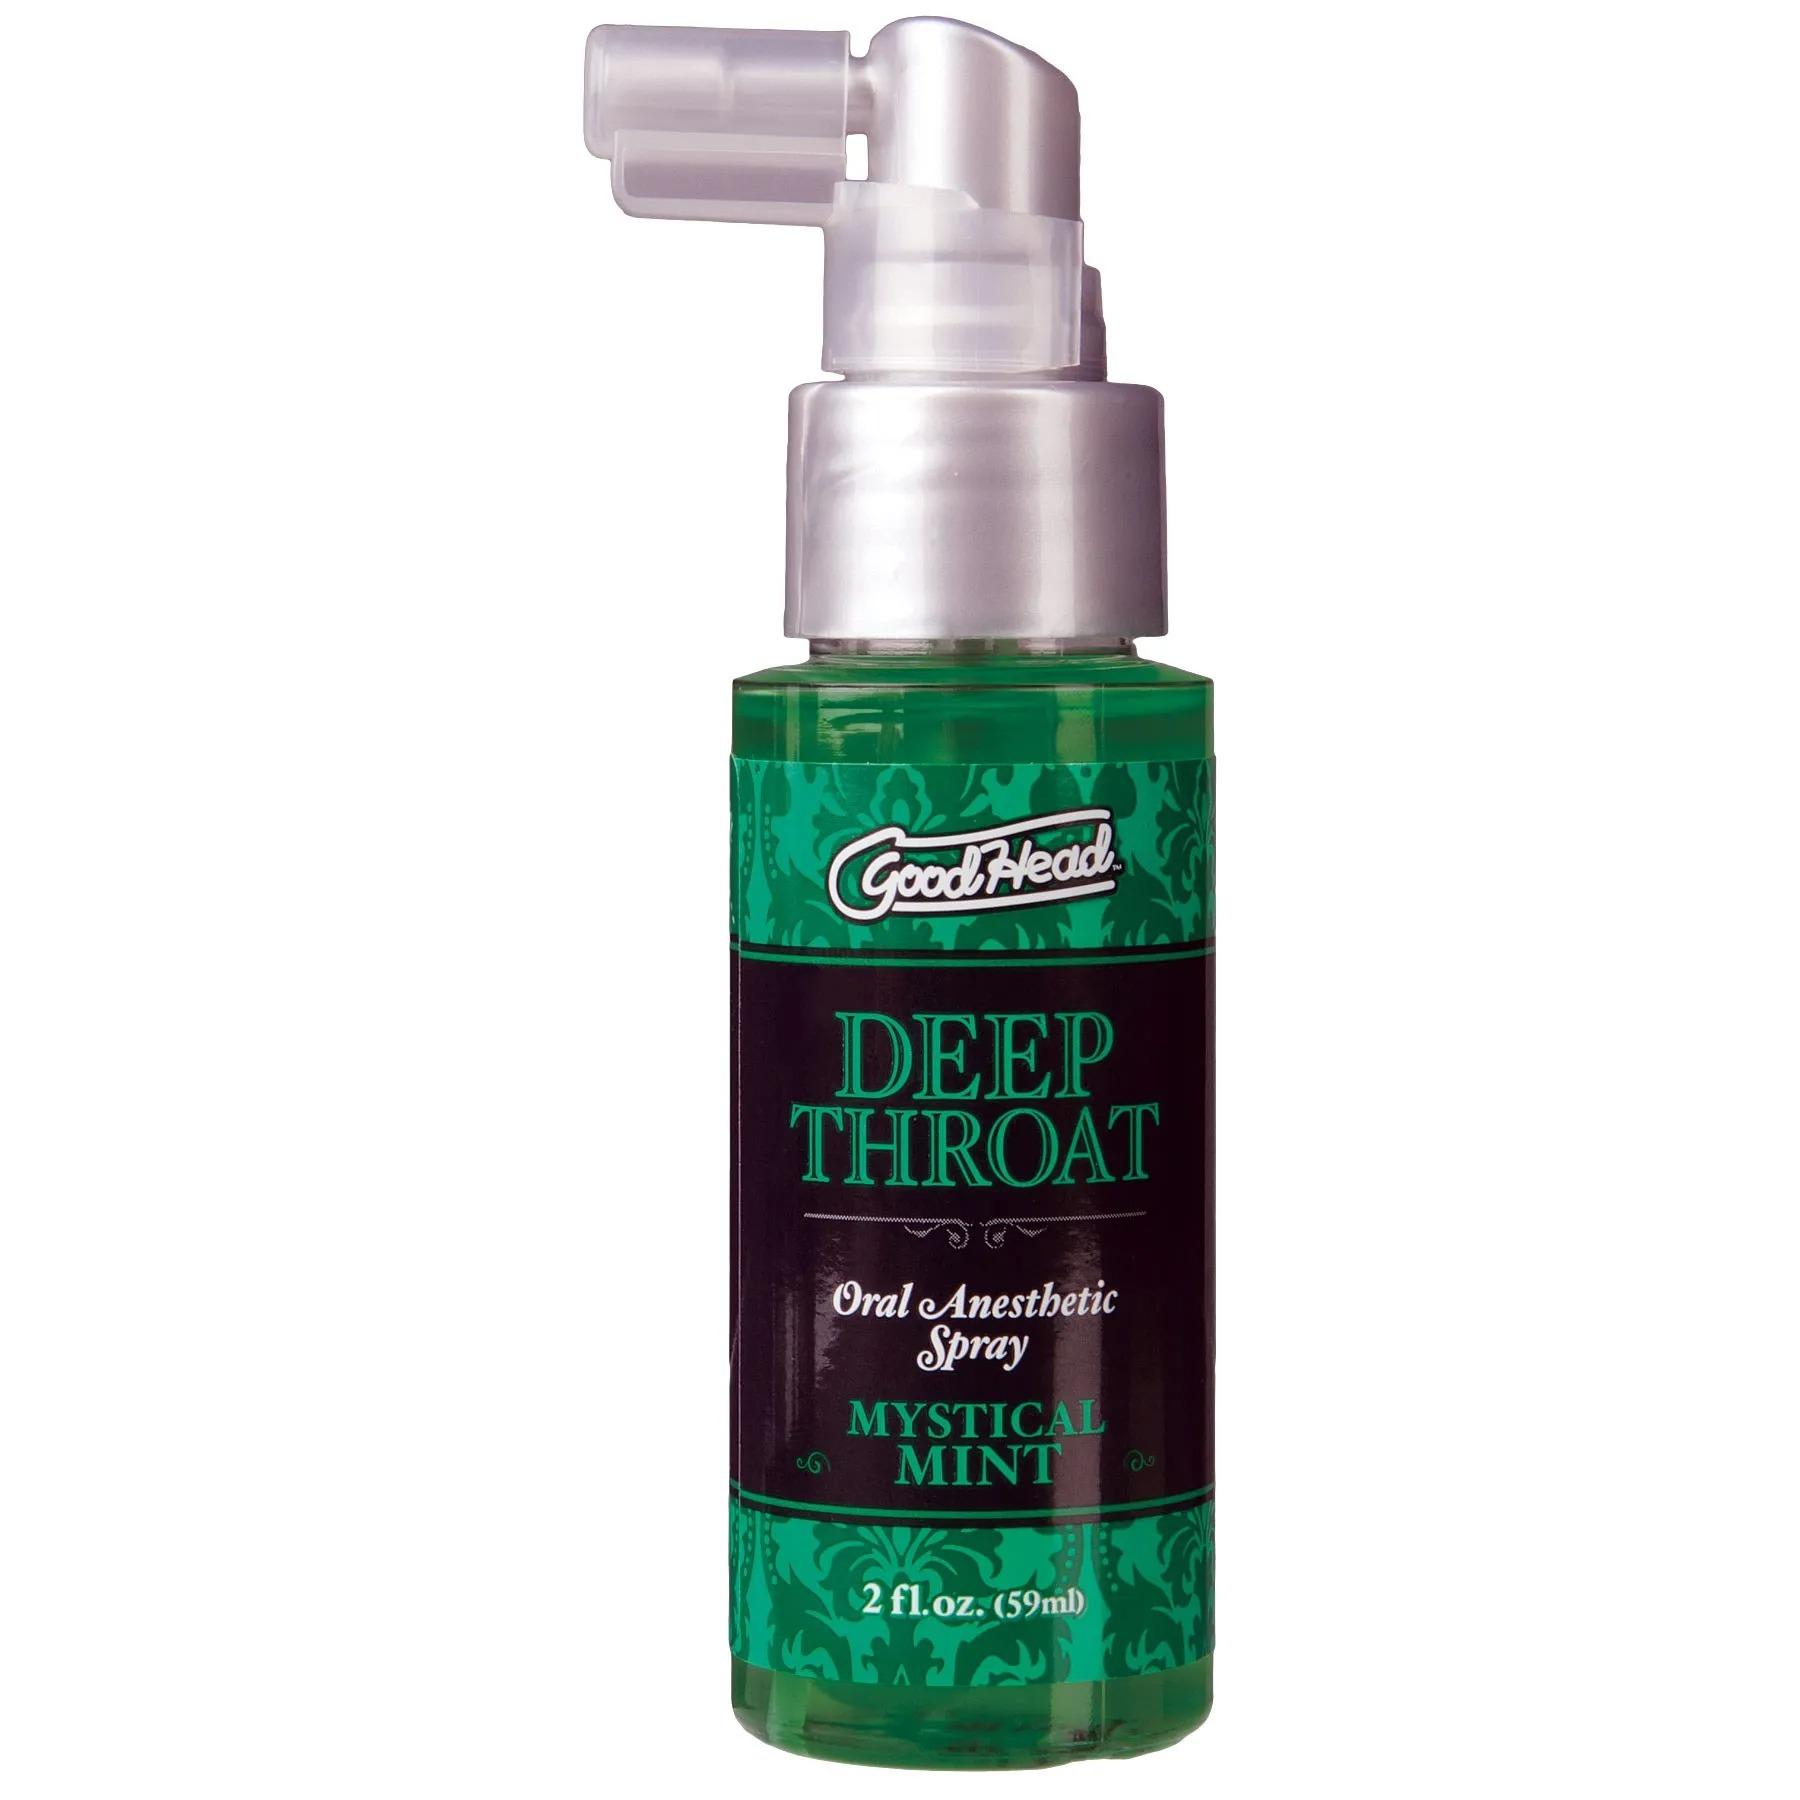 Goodhead Deep Throat Spray desensitizing spray